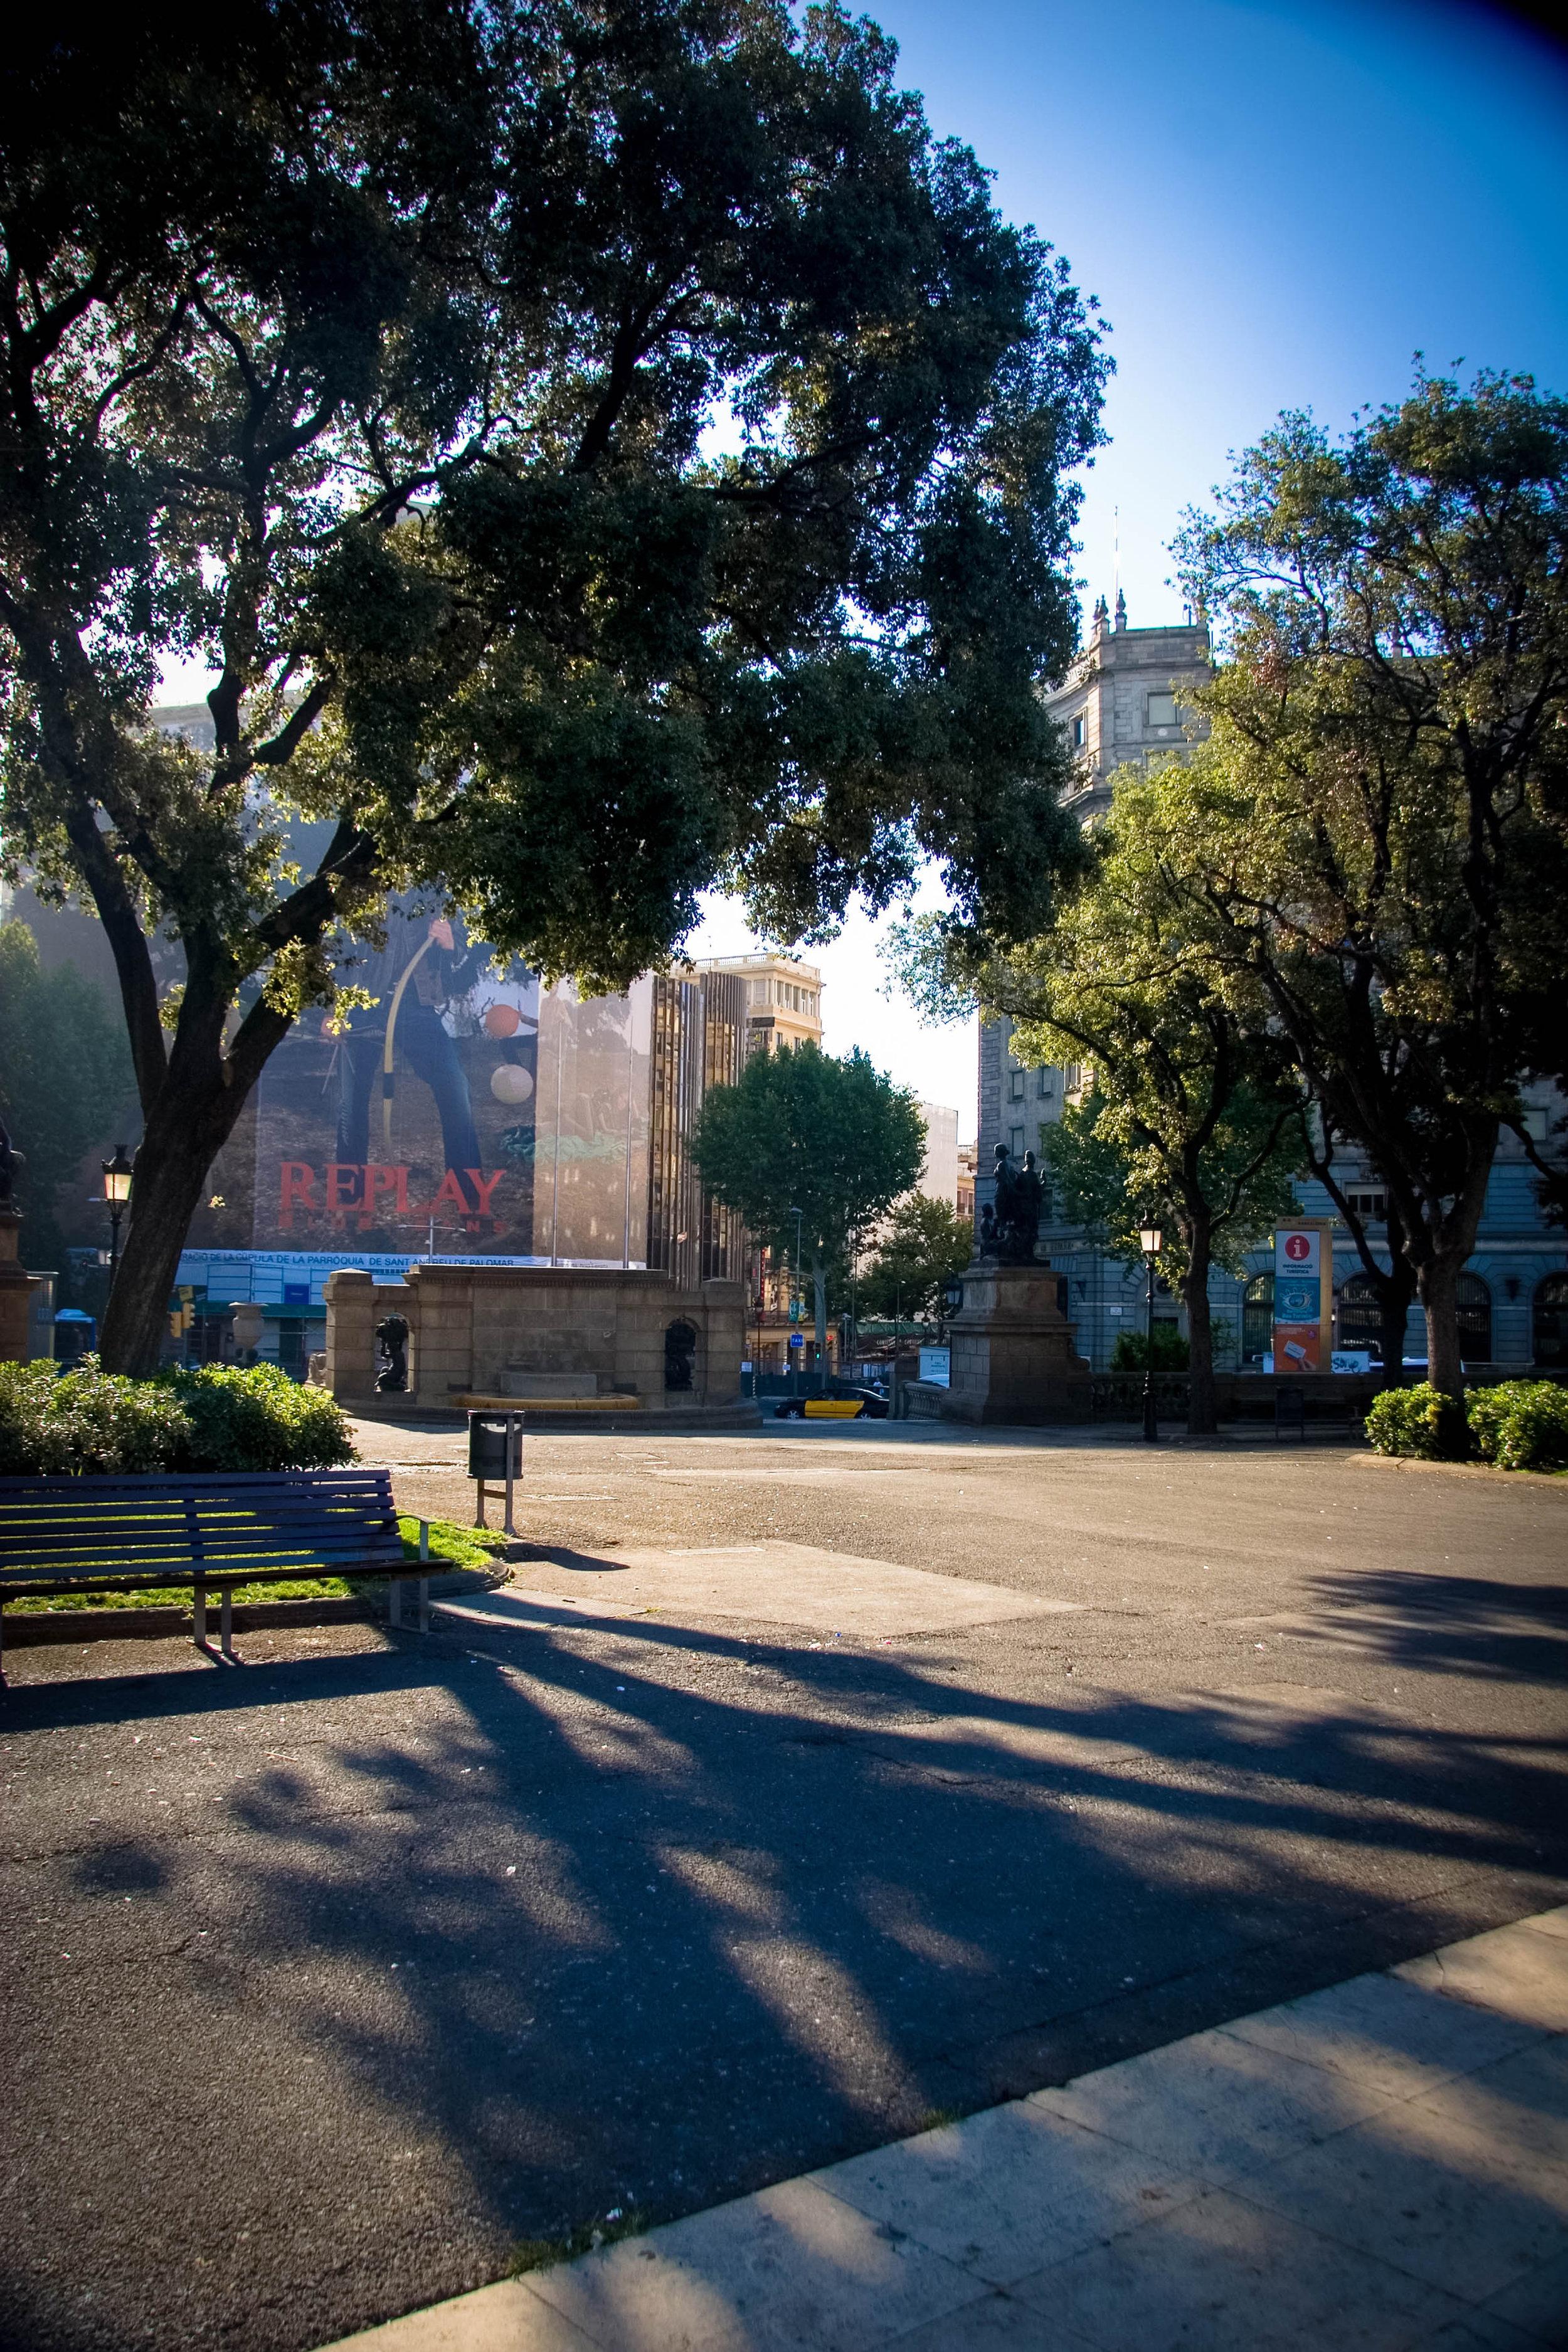 6am on a Friday in Plaza Catalunya. Barcelona